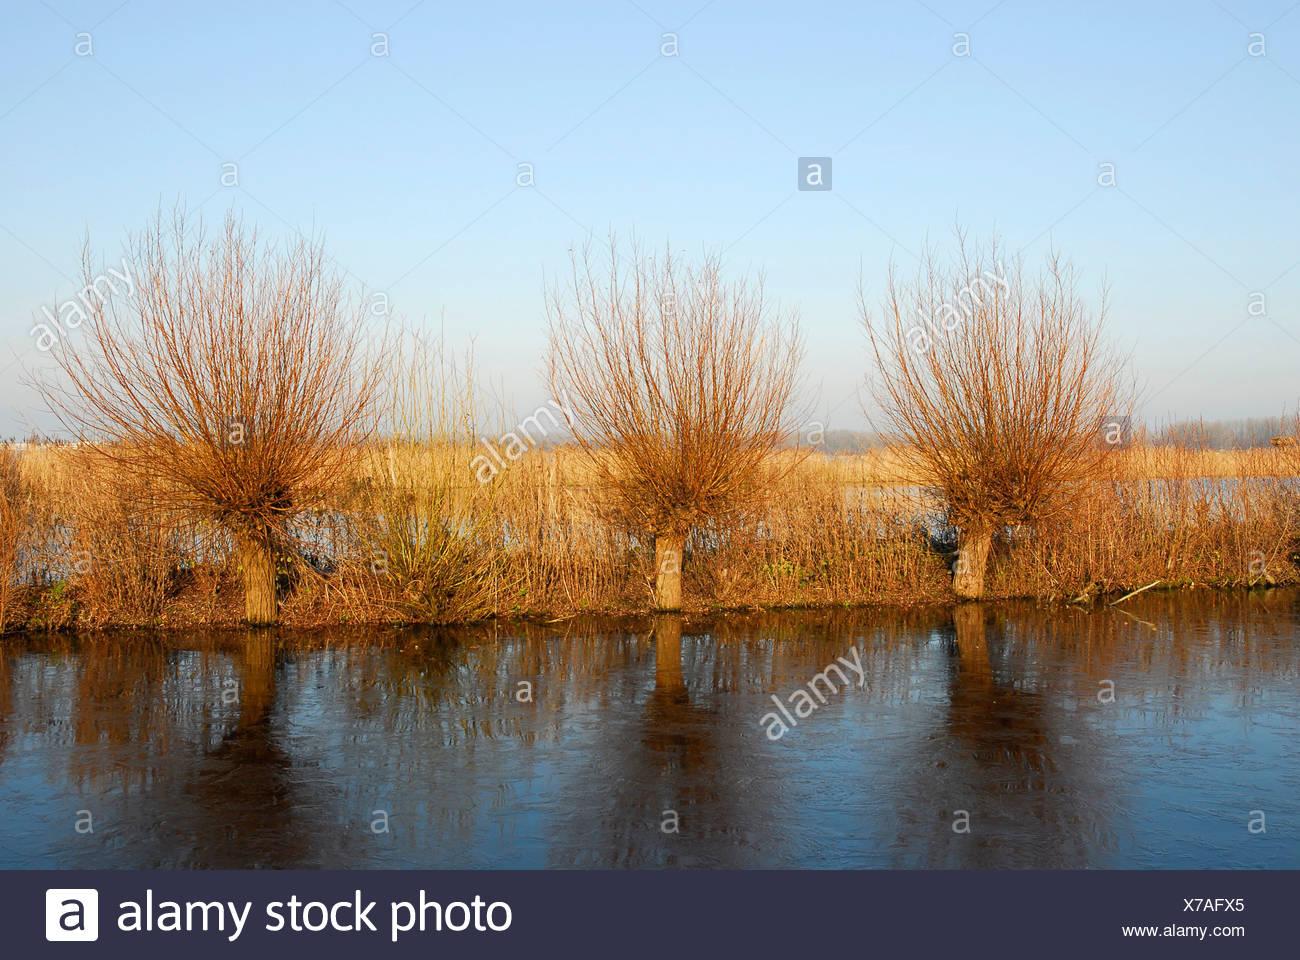 Pollard willow trees at lakeside, Reeuwijkse Plassen, South Holland, The Netherlands - Stock Image